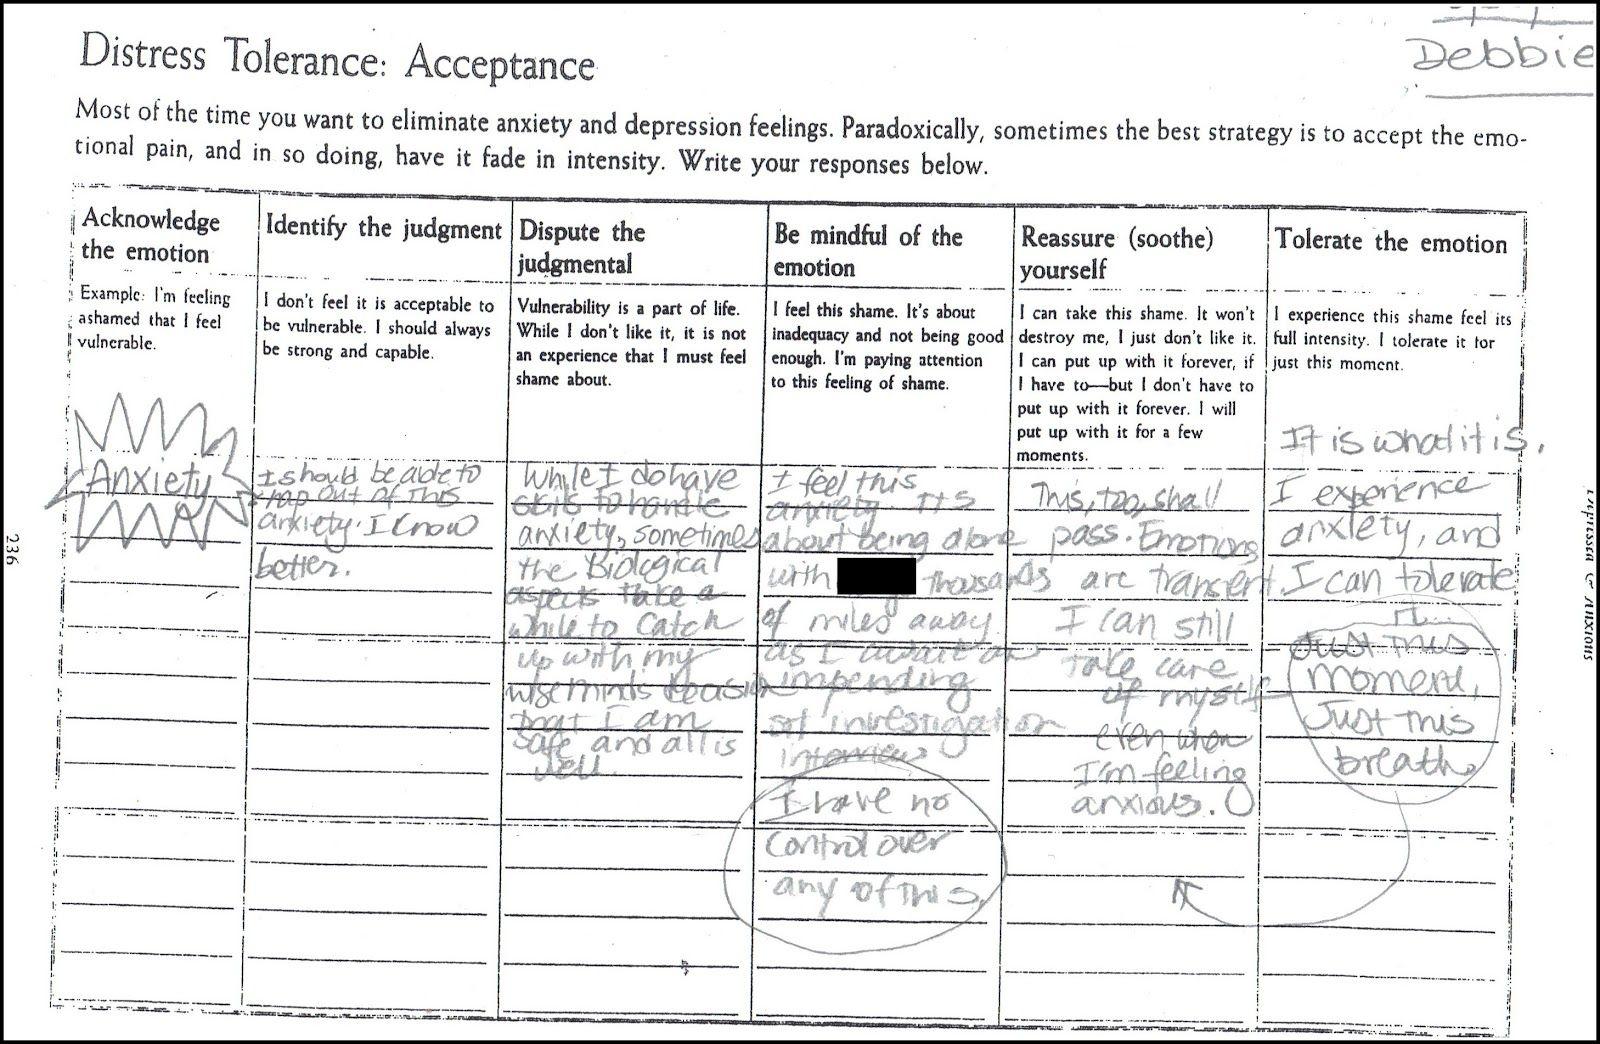 Distress Tolerance Acceptance Worksheet Dbt